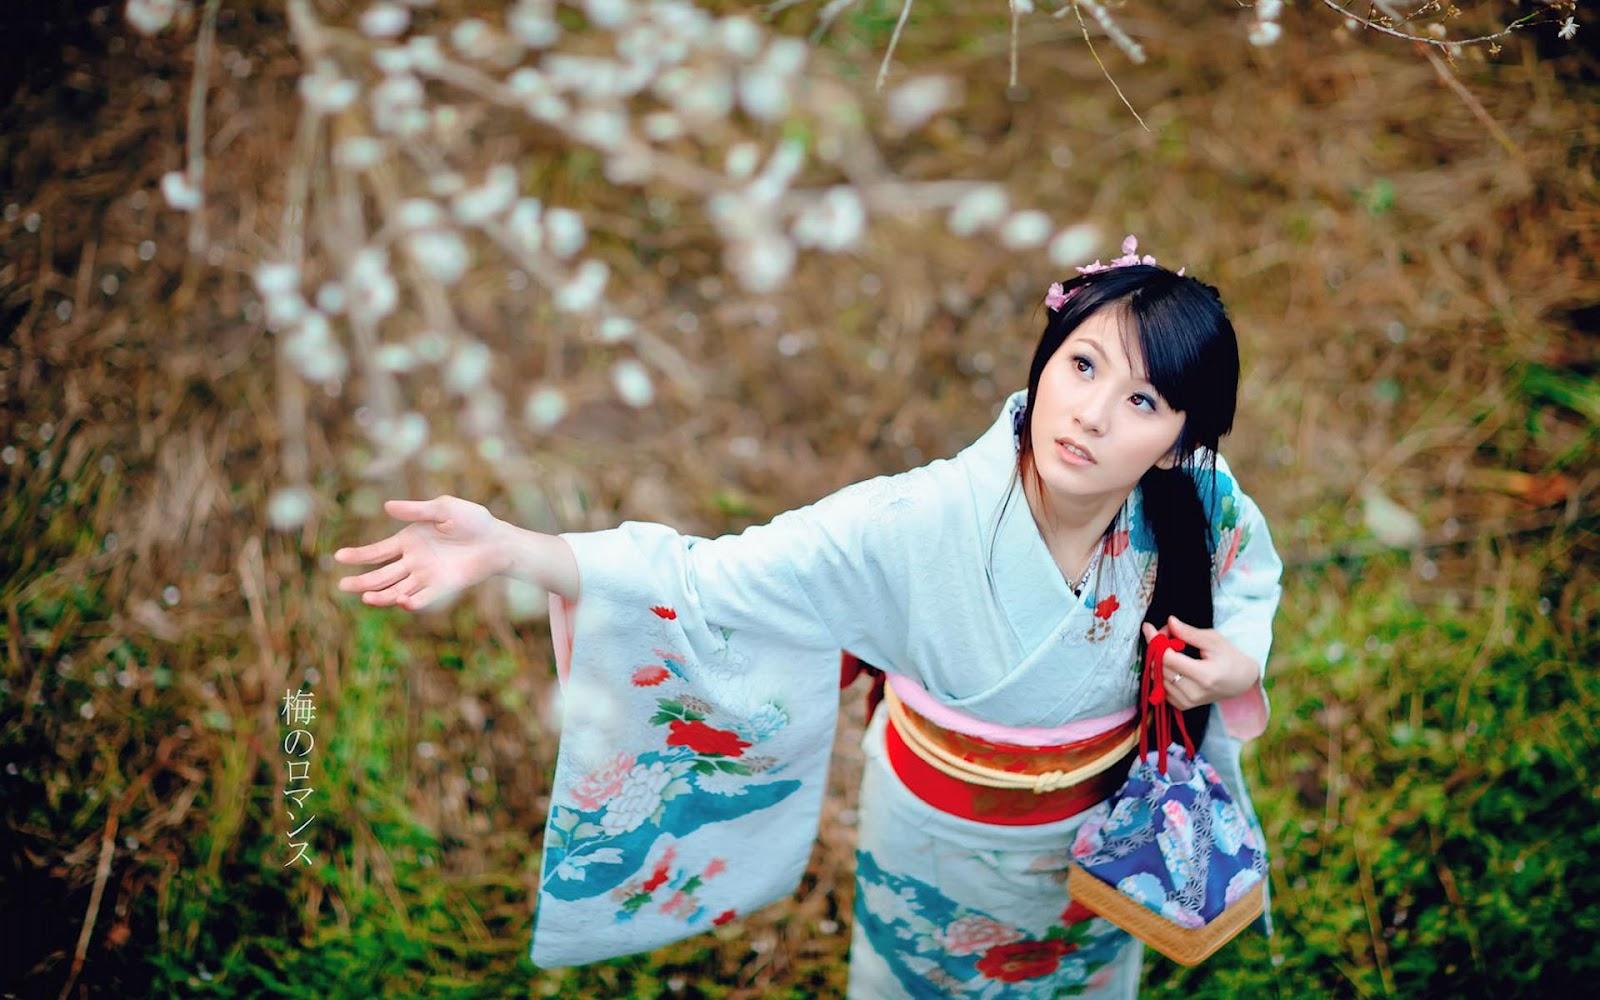 Japanese wallpapers: Kimono wallpapers